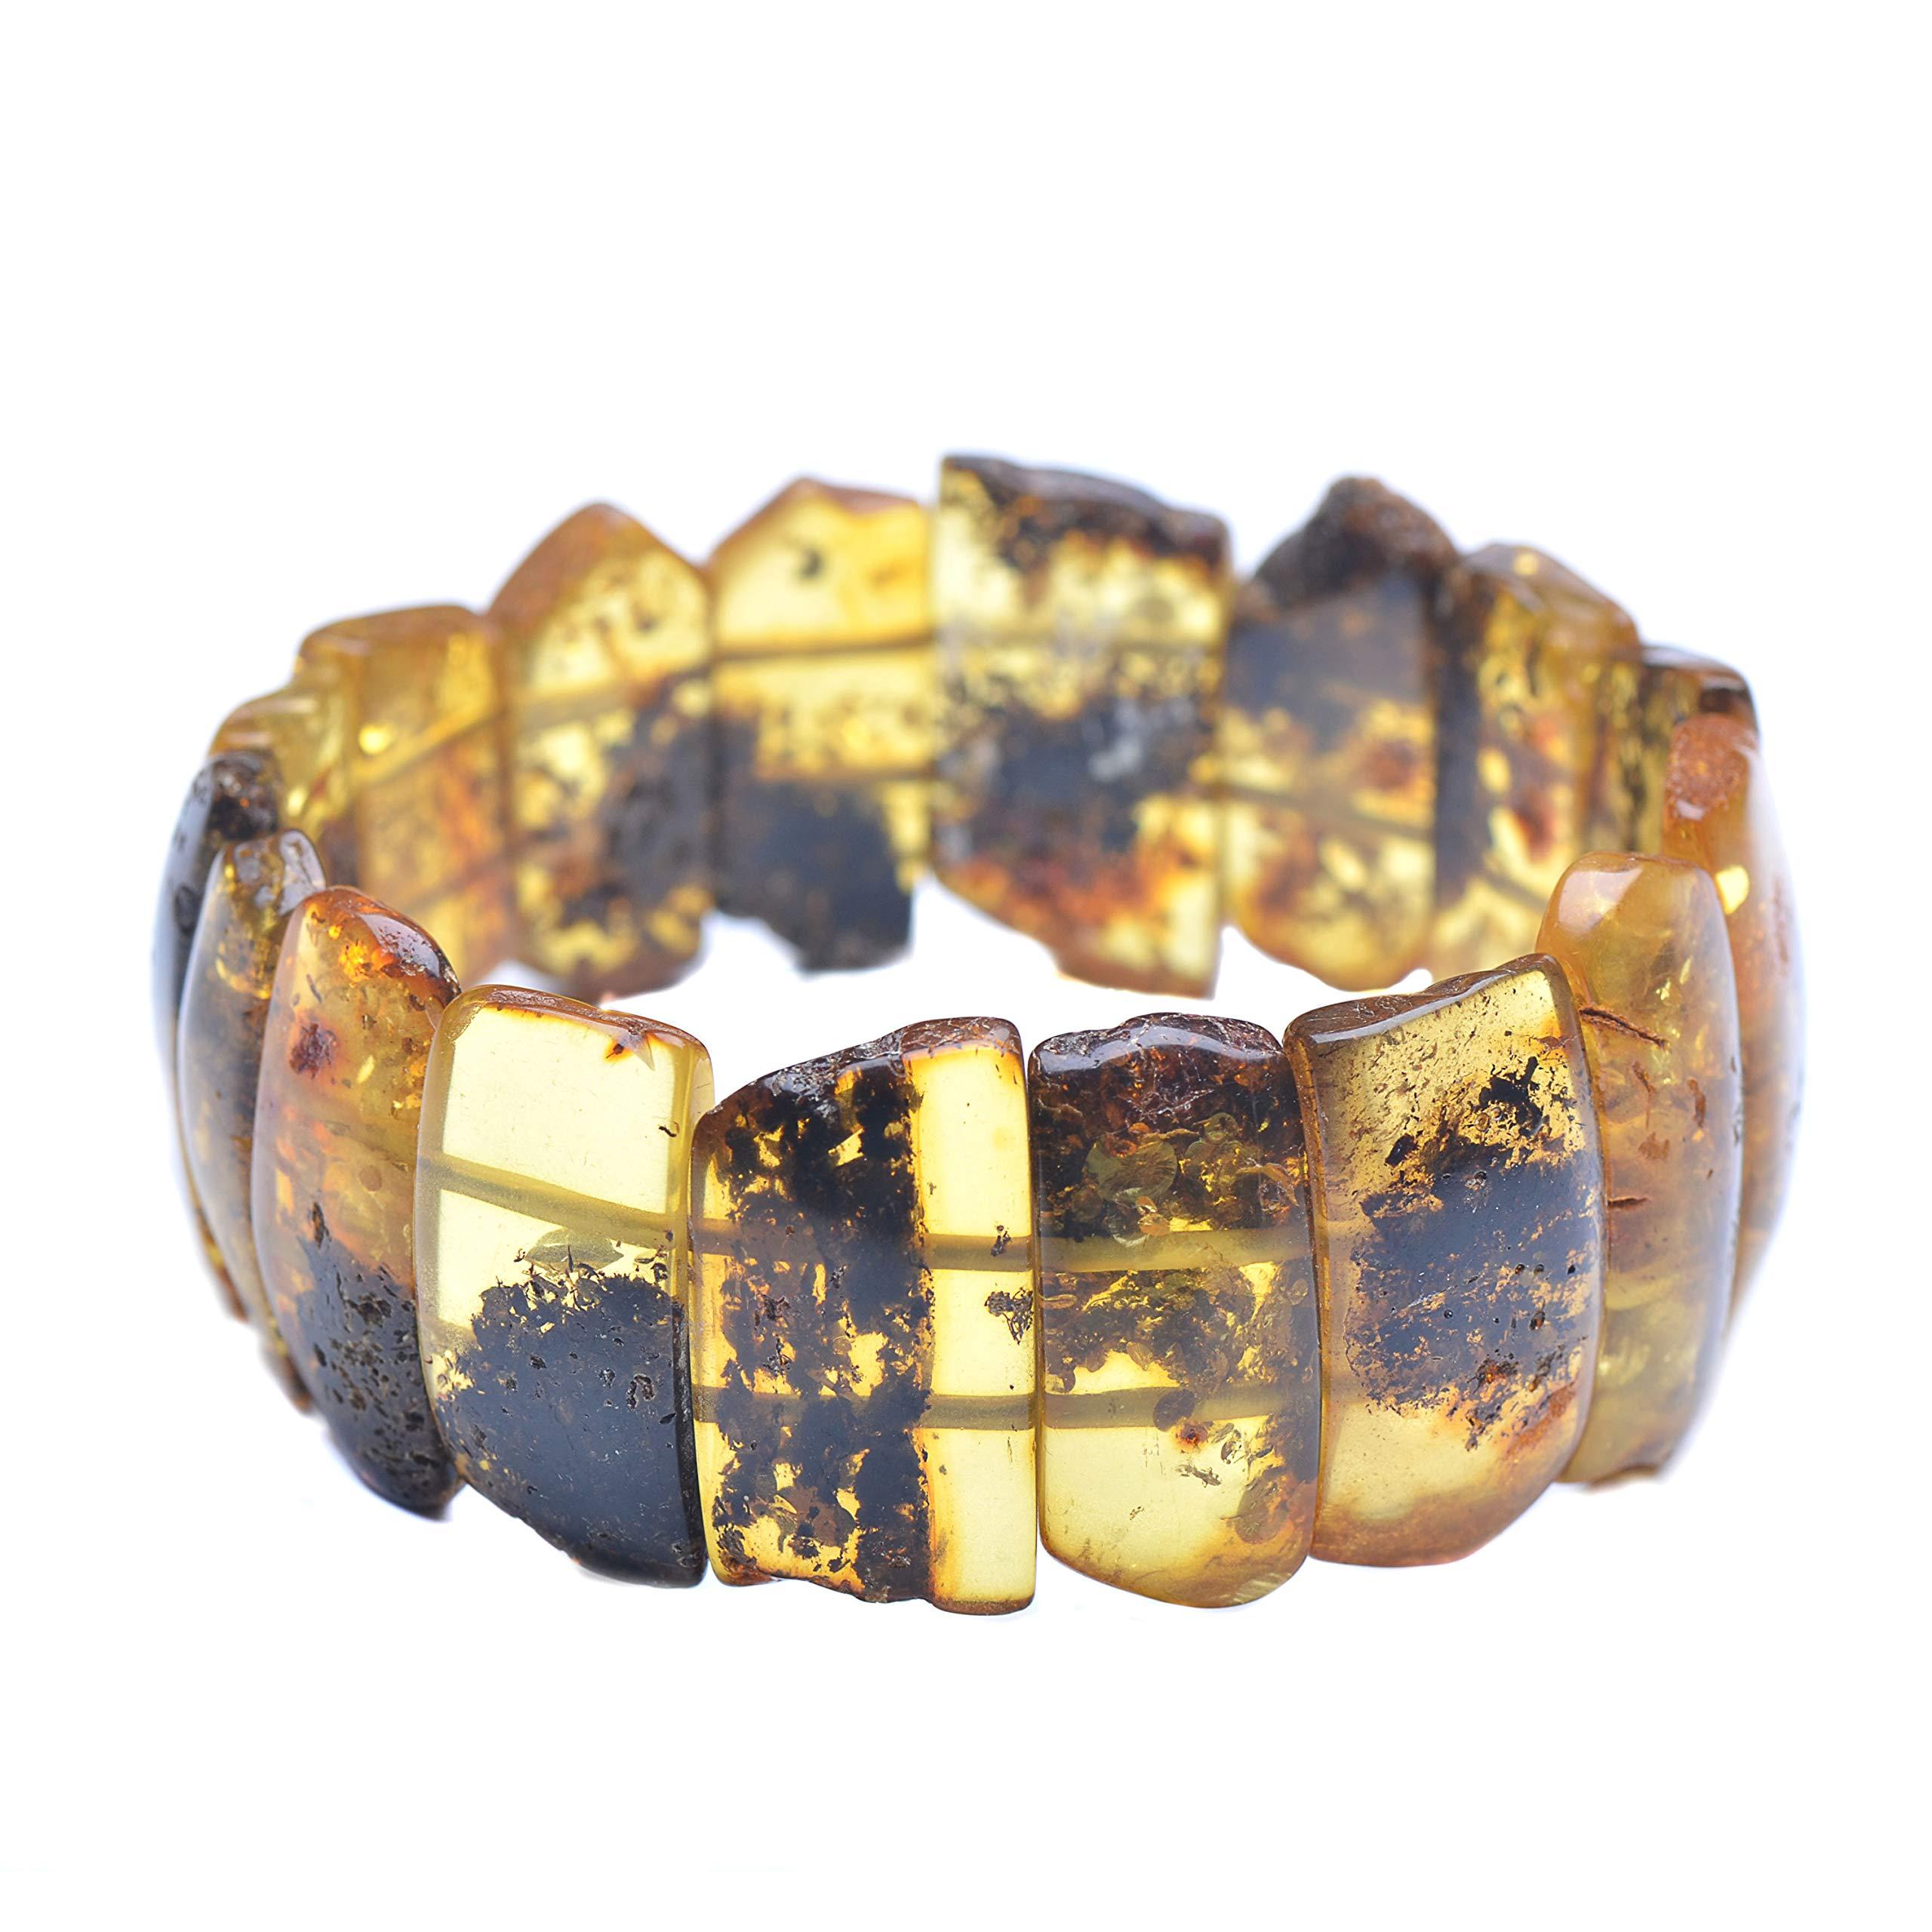 Vintage Bracelet - Amber Bracelet - Vintage Amber Bracelet - Unique Baltic Amber Jewelry - Exclusive Bracelet - Genuine Amber by Genuine Amber